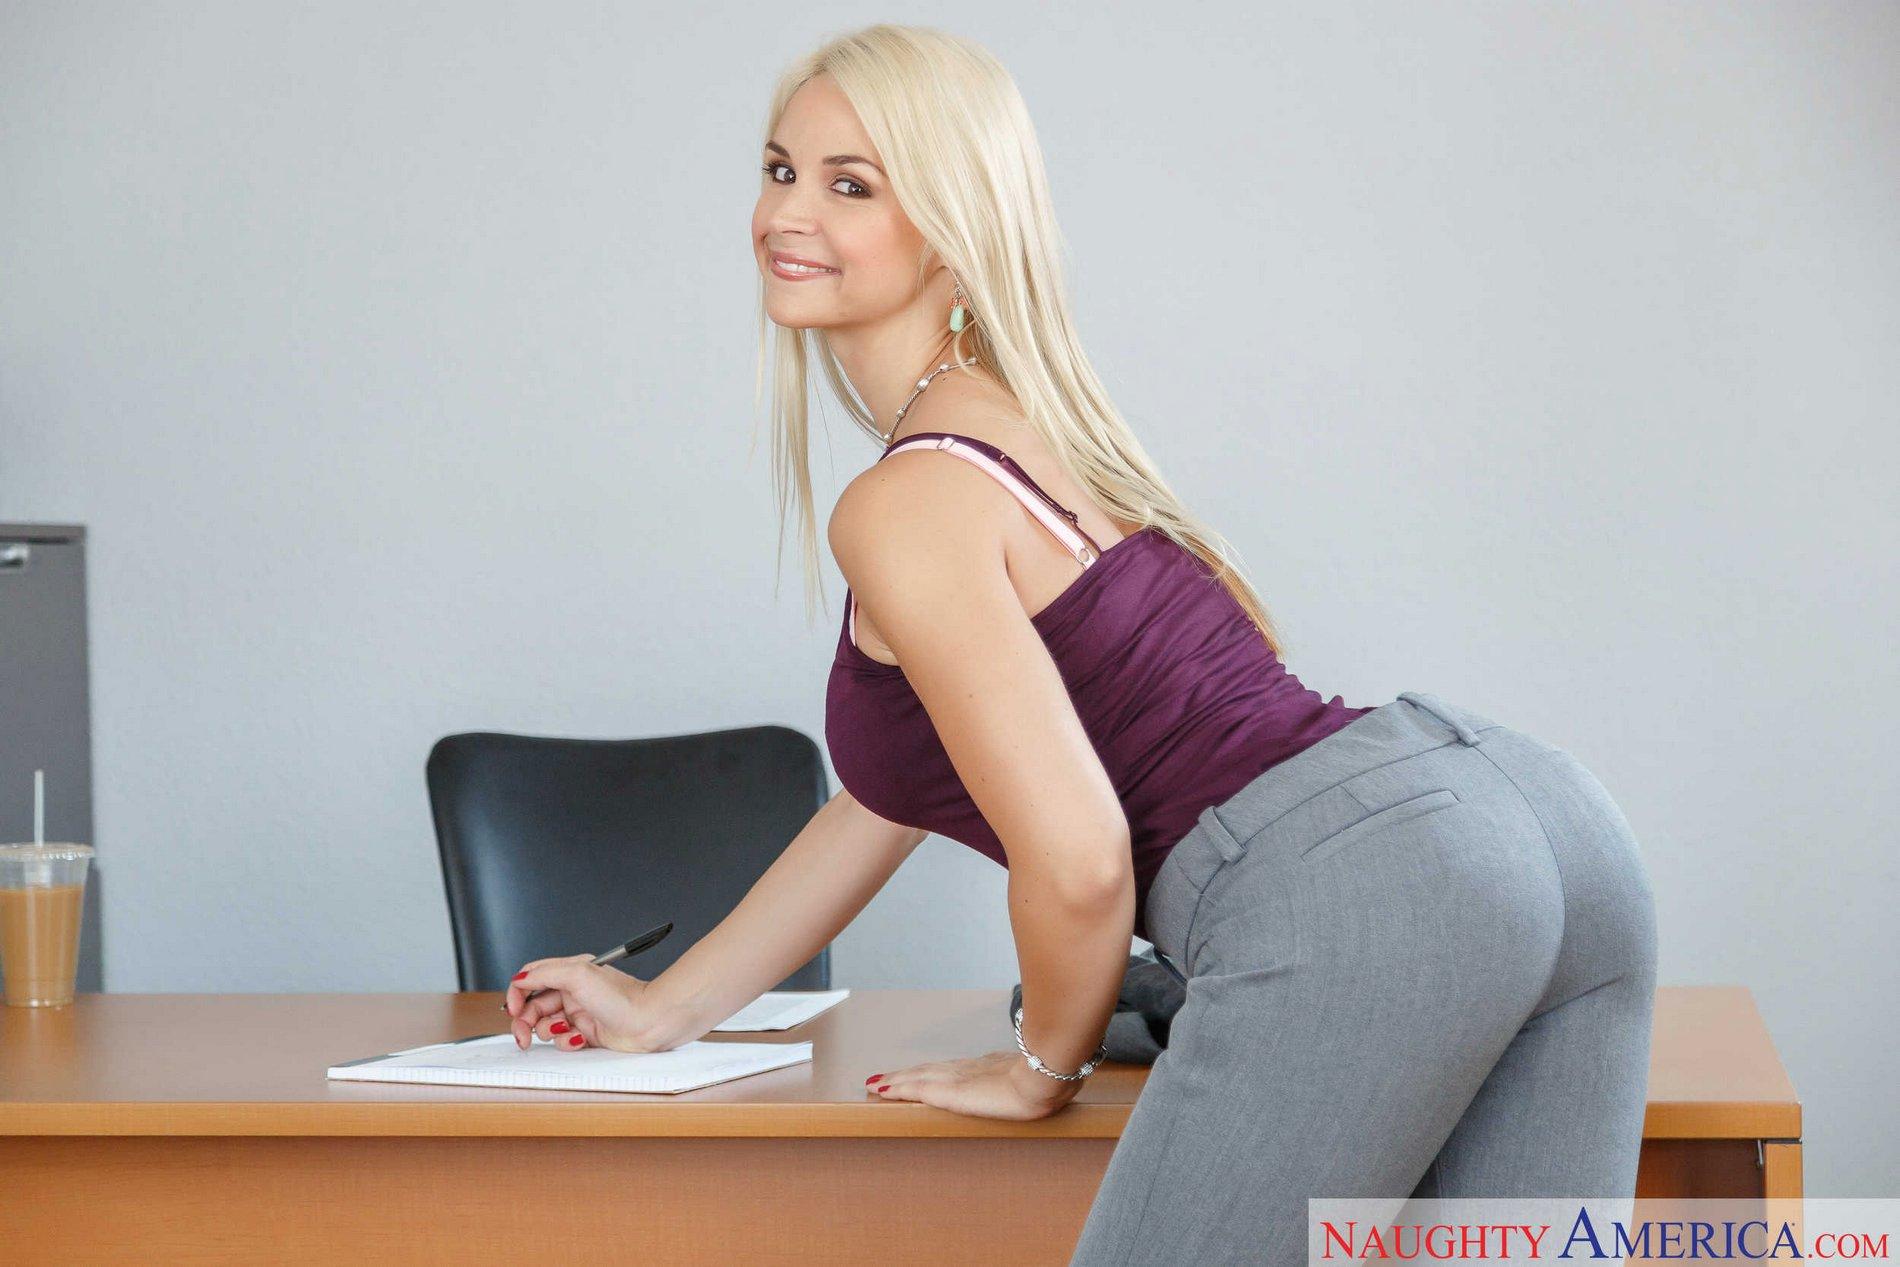 from Adonis sarah teacher porn star